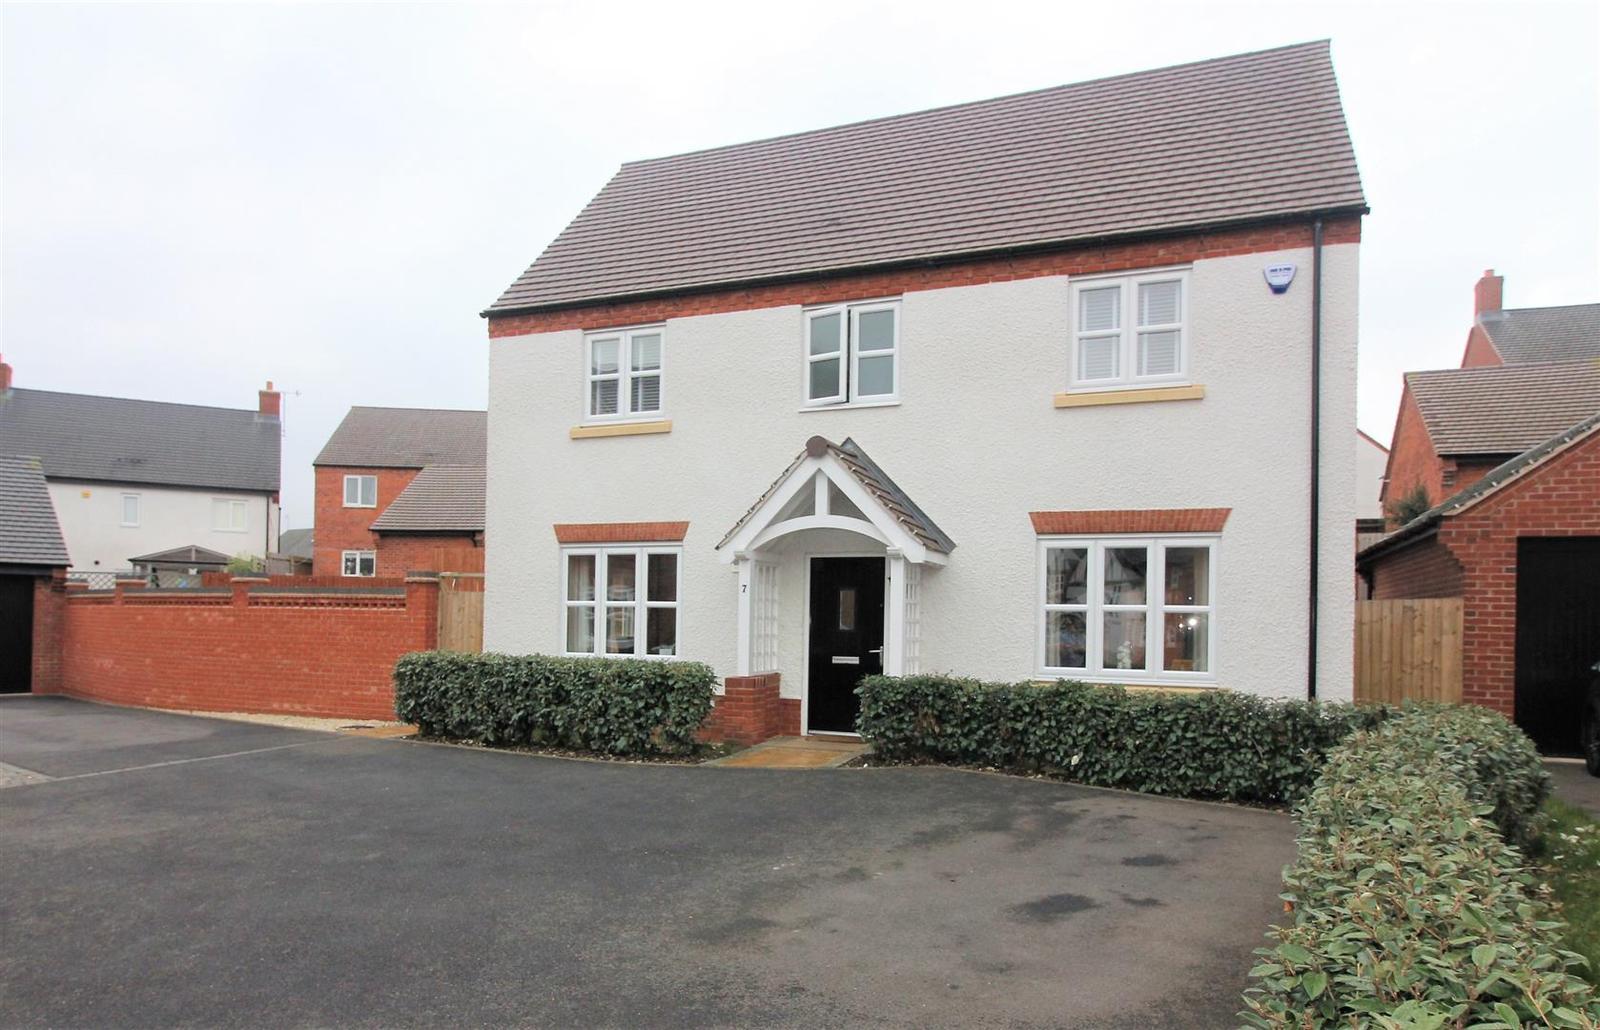 4 Bedrooms Property for sale in Piper Avenue, Castle Donington, DE74 2UE